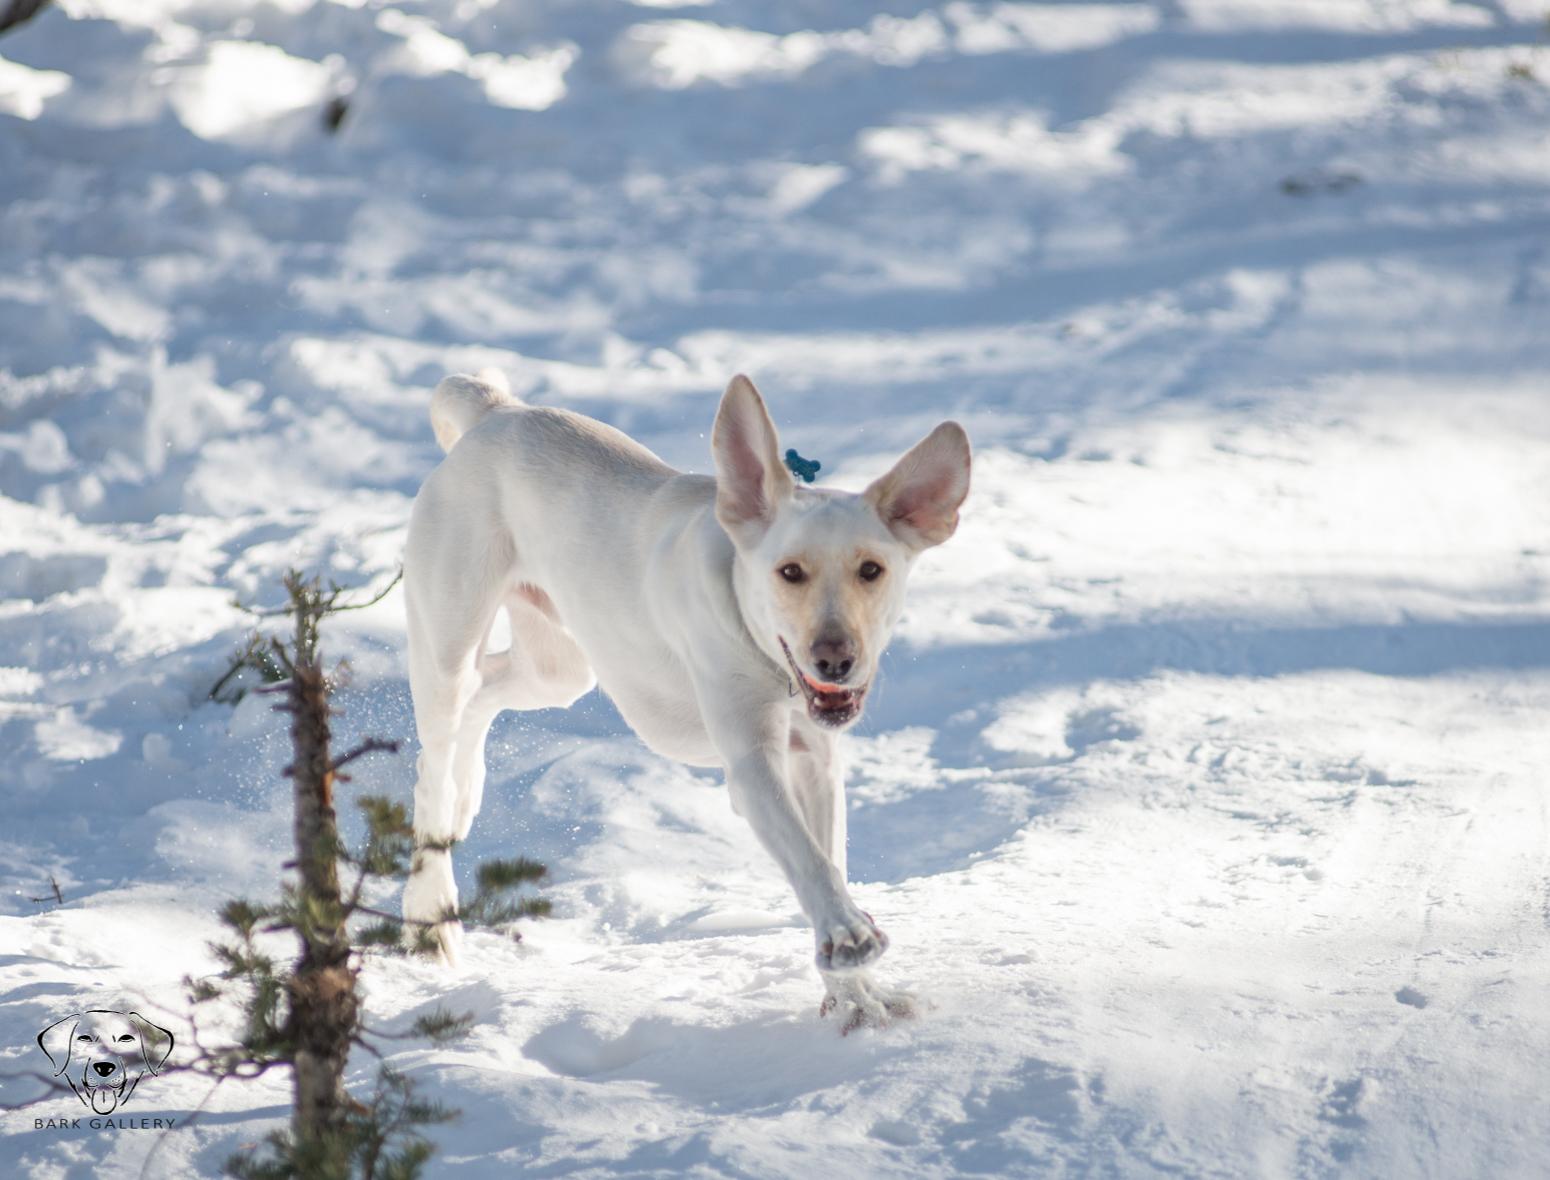 Bear, Bark Gallery Mascot- Snow Day